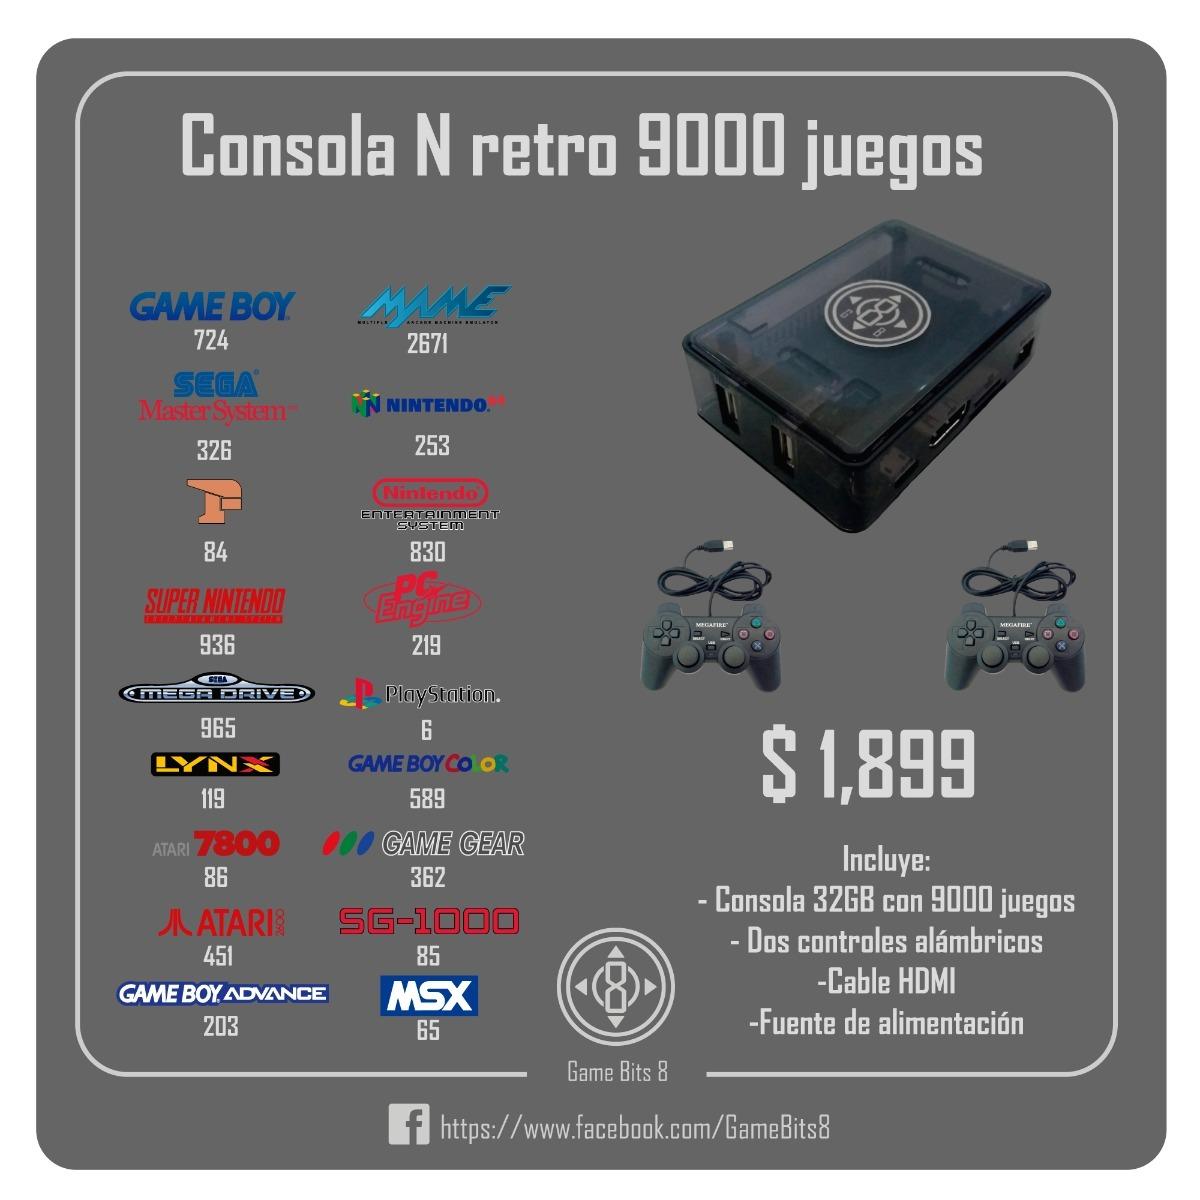 Consola Retro 9000 Mil Juegos Tipo: Orange Pi, Raspberry Pi